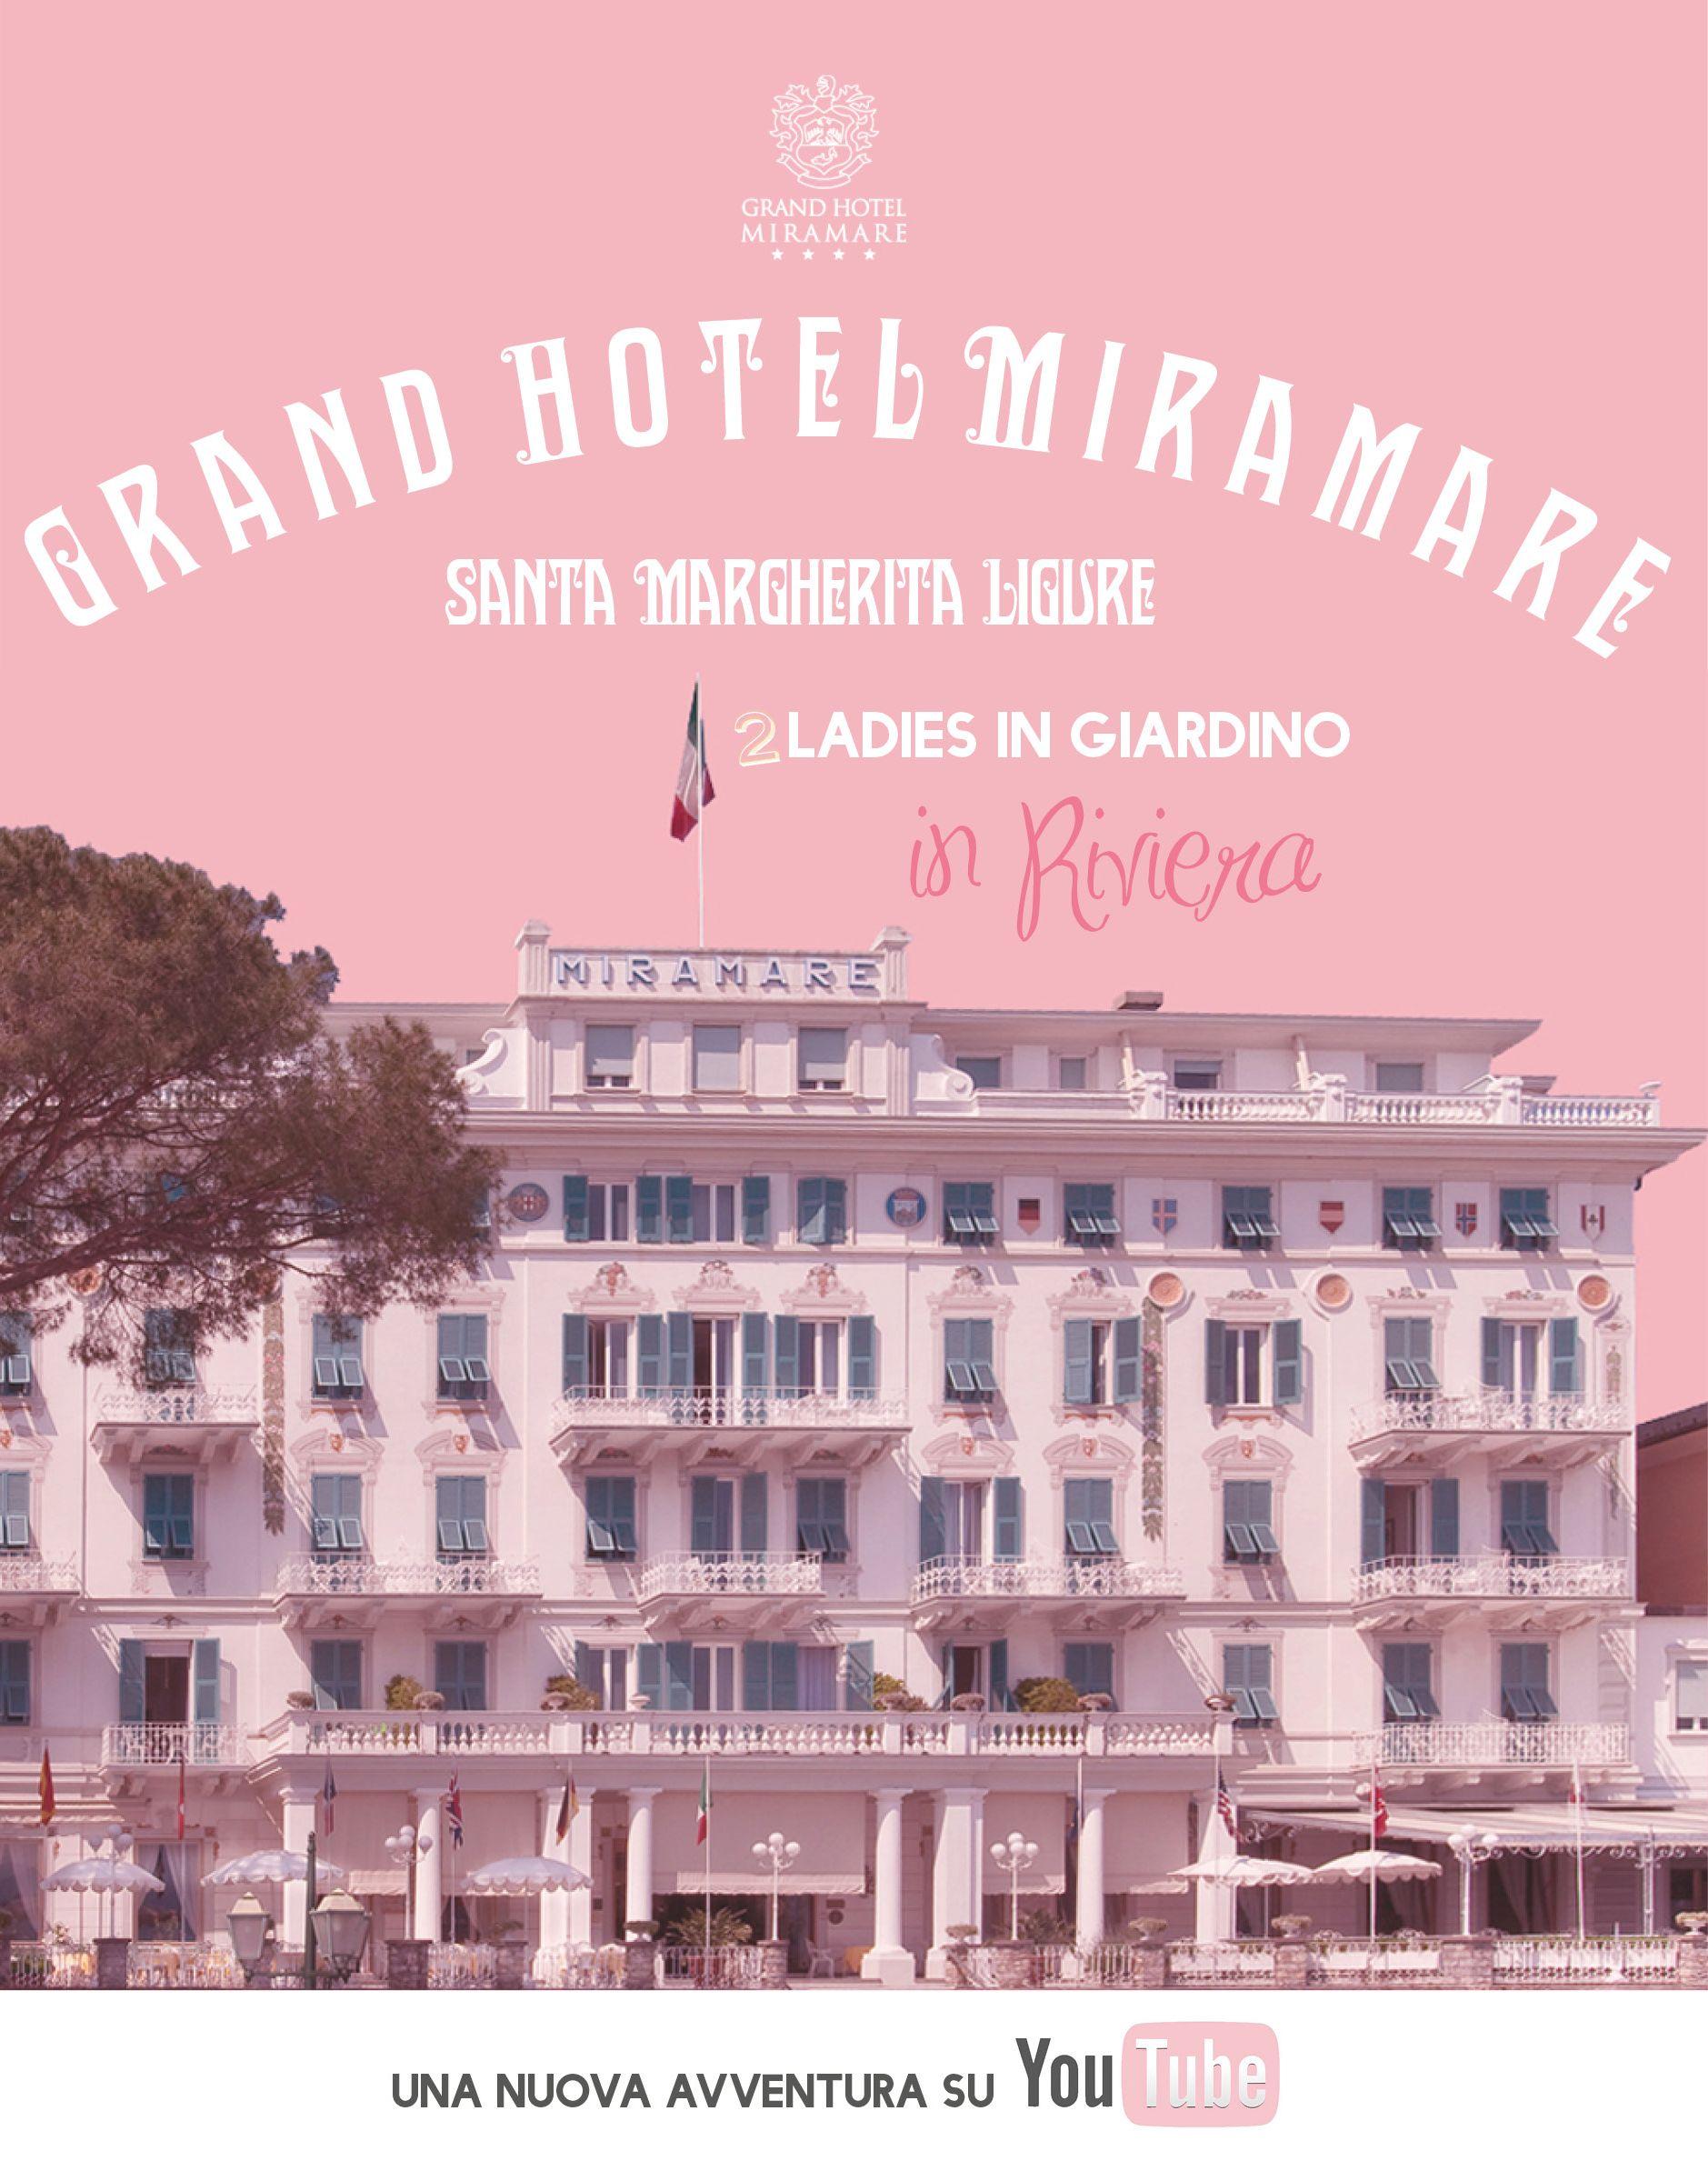 grand hotel 2 ladies in riviera 2